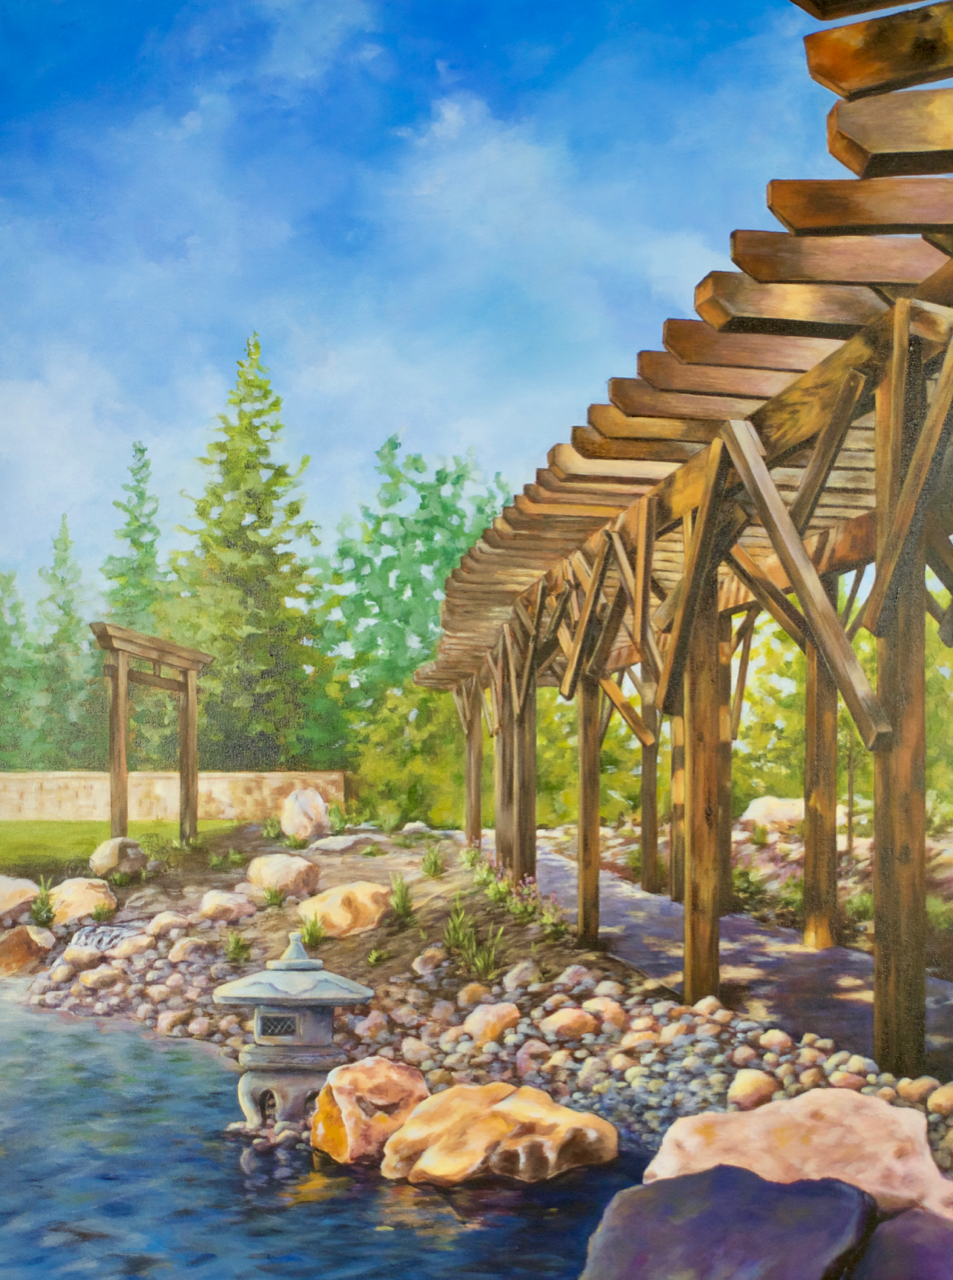 'Pondering Upon Reflection', Acrylic Painting of Japanese Garden Trellis, torii gate, ishidoro rocks, waterfall, by Ashley Oshiro, Calgary, Alberta, Local Fine Artist, Original Art